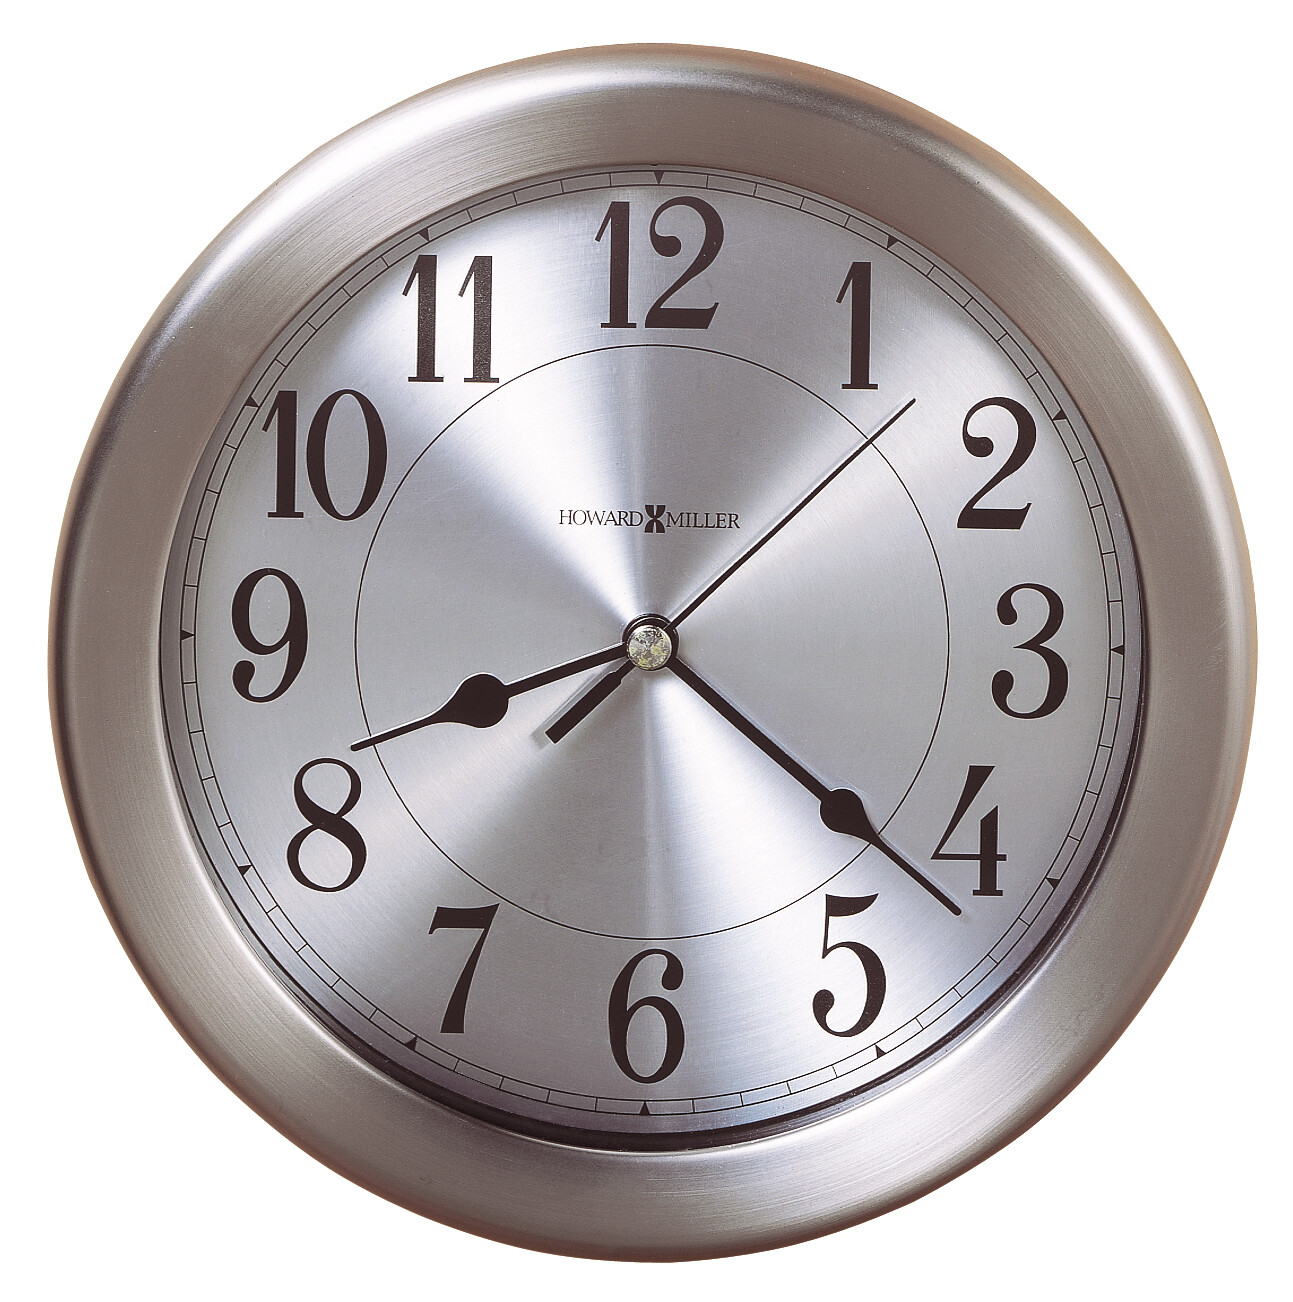 Howard Miller Pisces 625313 Wall Clock